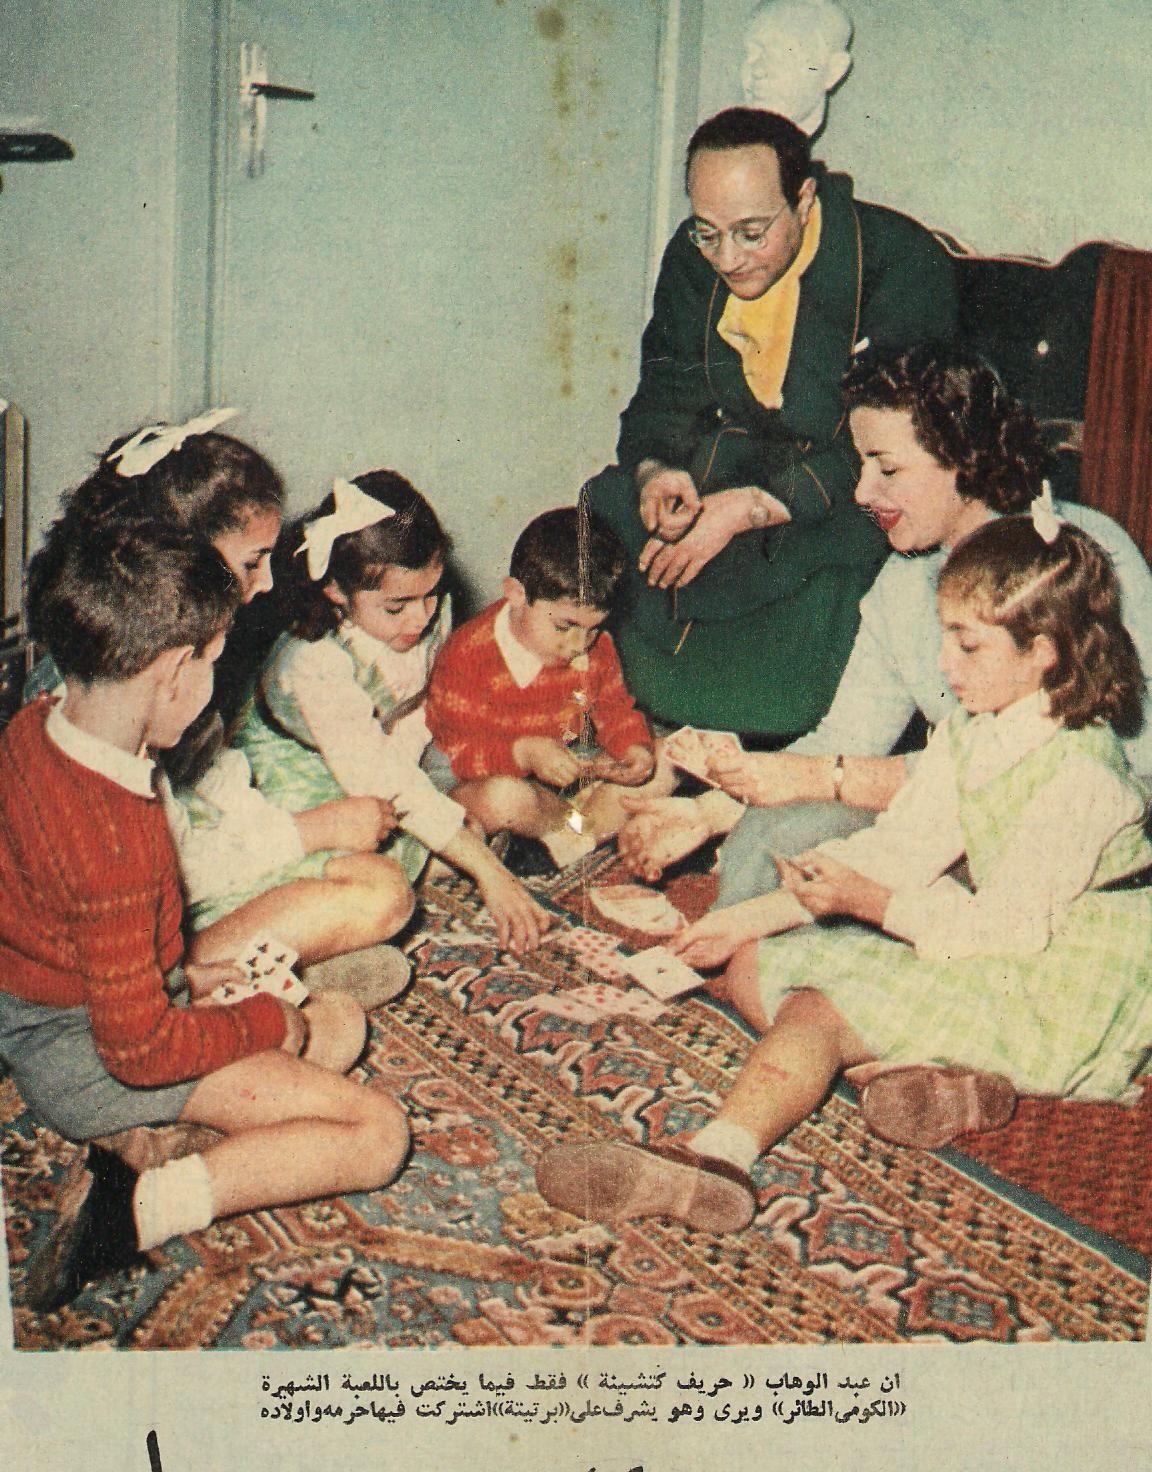 Abdelwahab En Famille Egypt History Egyptian Beauty Old Egypt